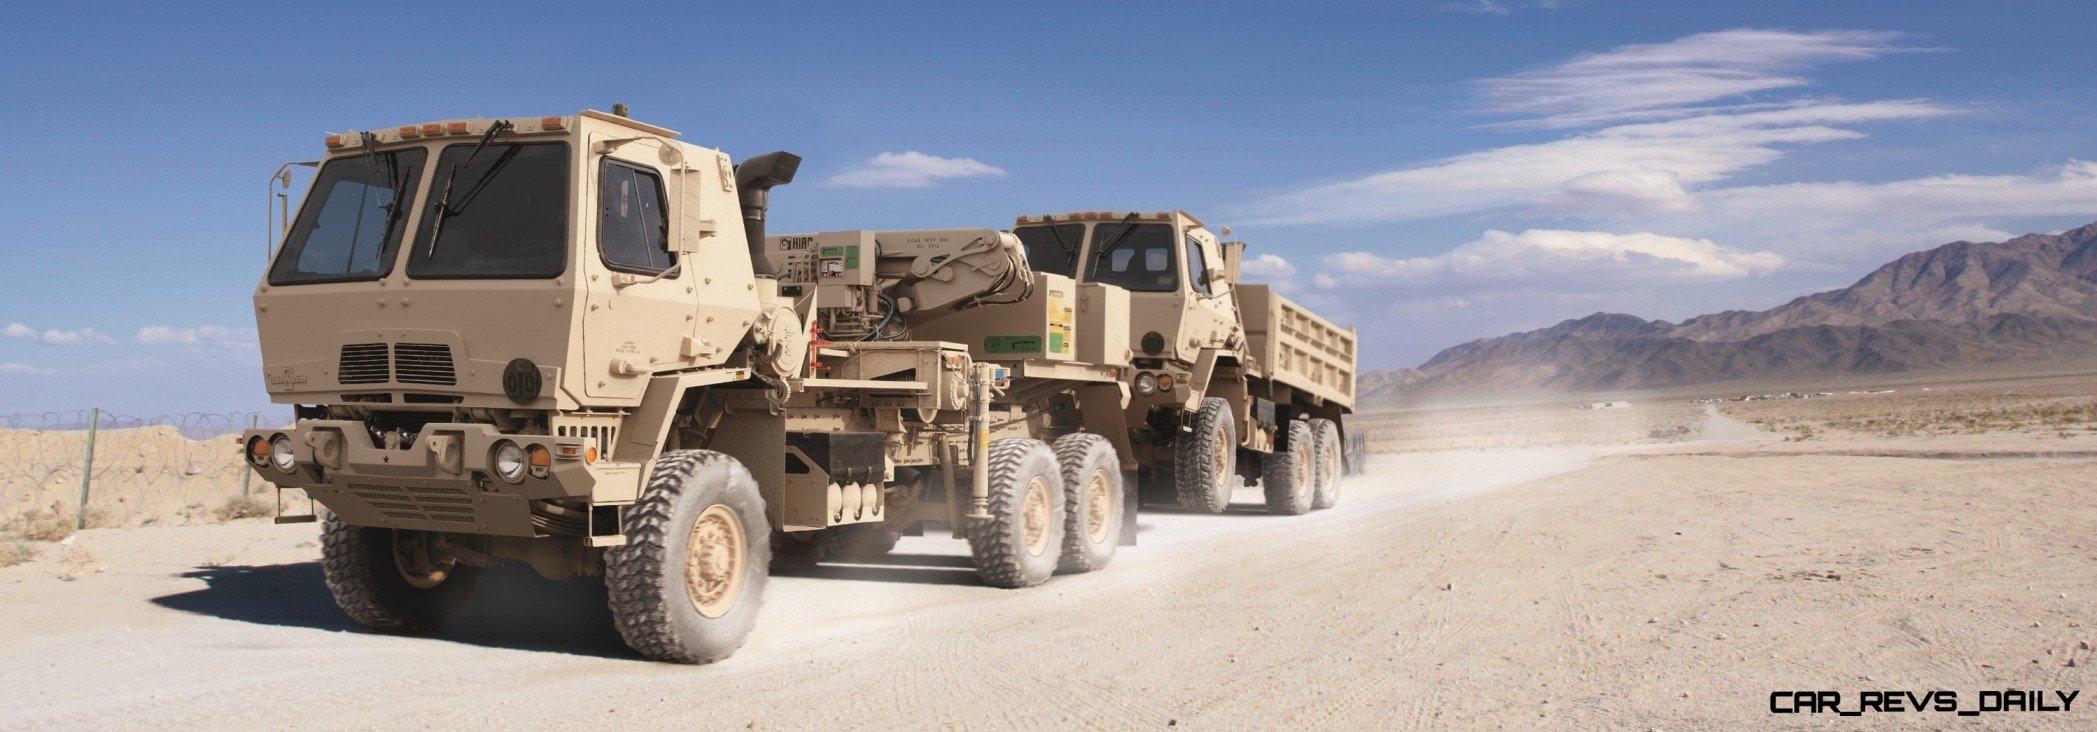 CarRevsDaily.com - Oshkosh Defense Medium and Heavy Showcase 5